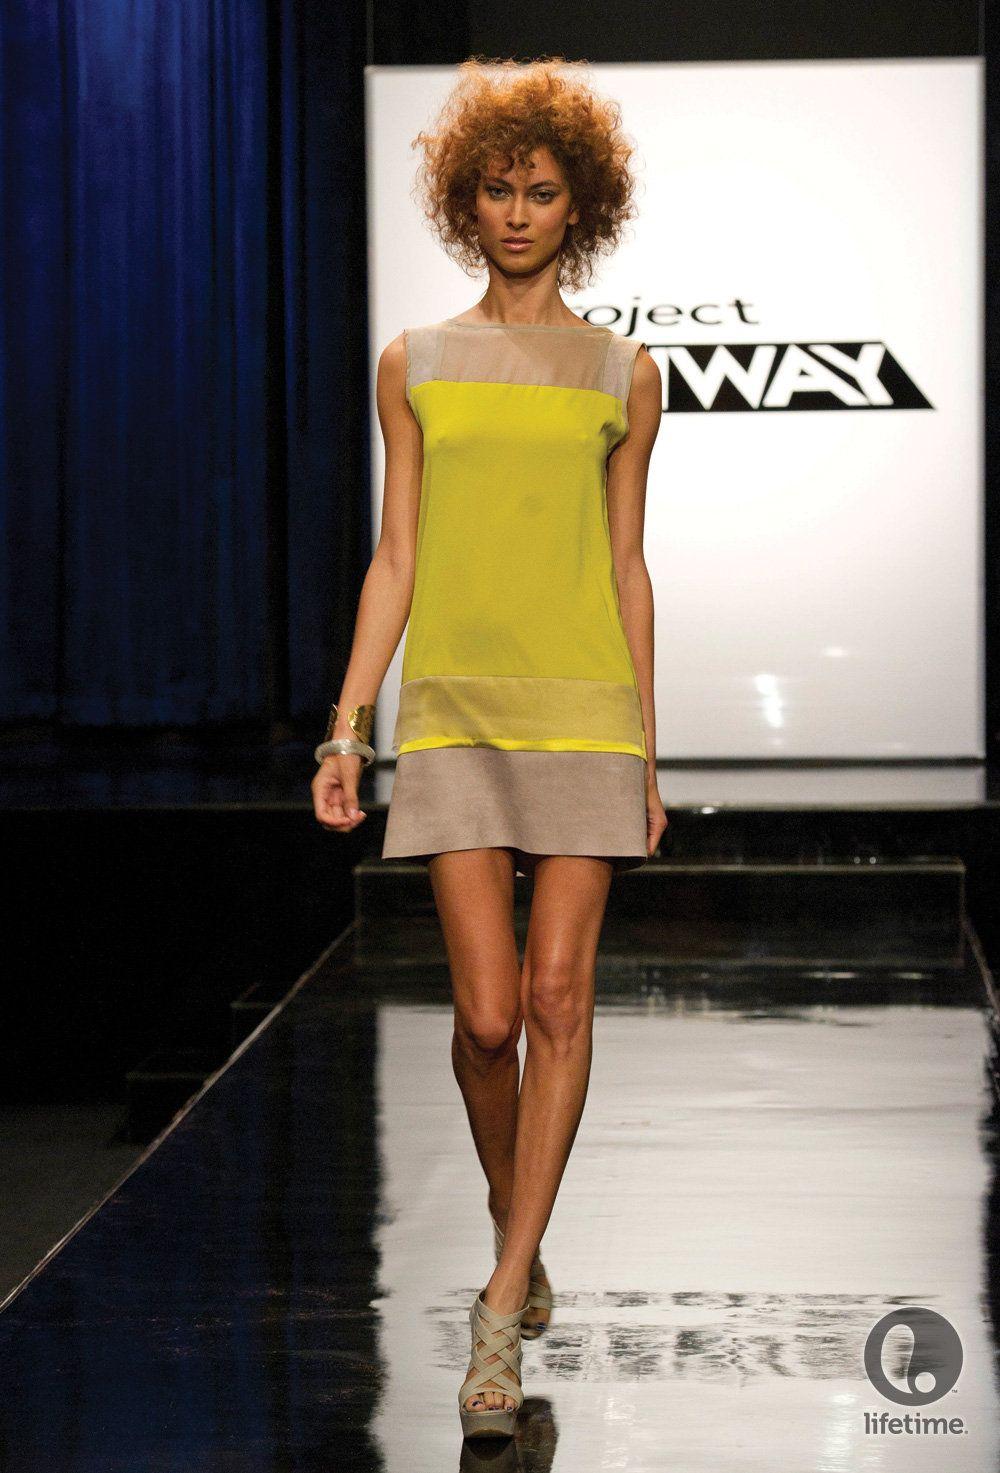 cdf82e688326 project runway winners dresses - Google Search | Interesting Fasion ...